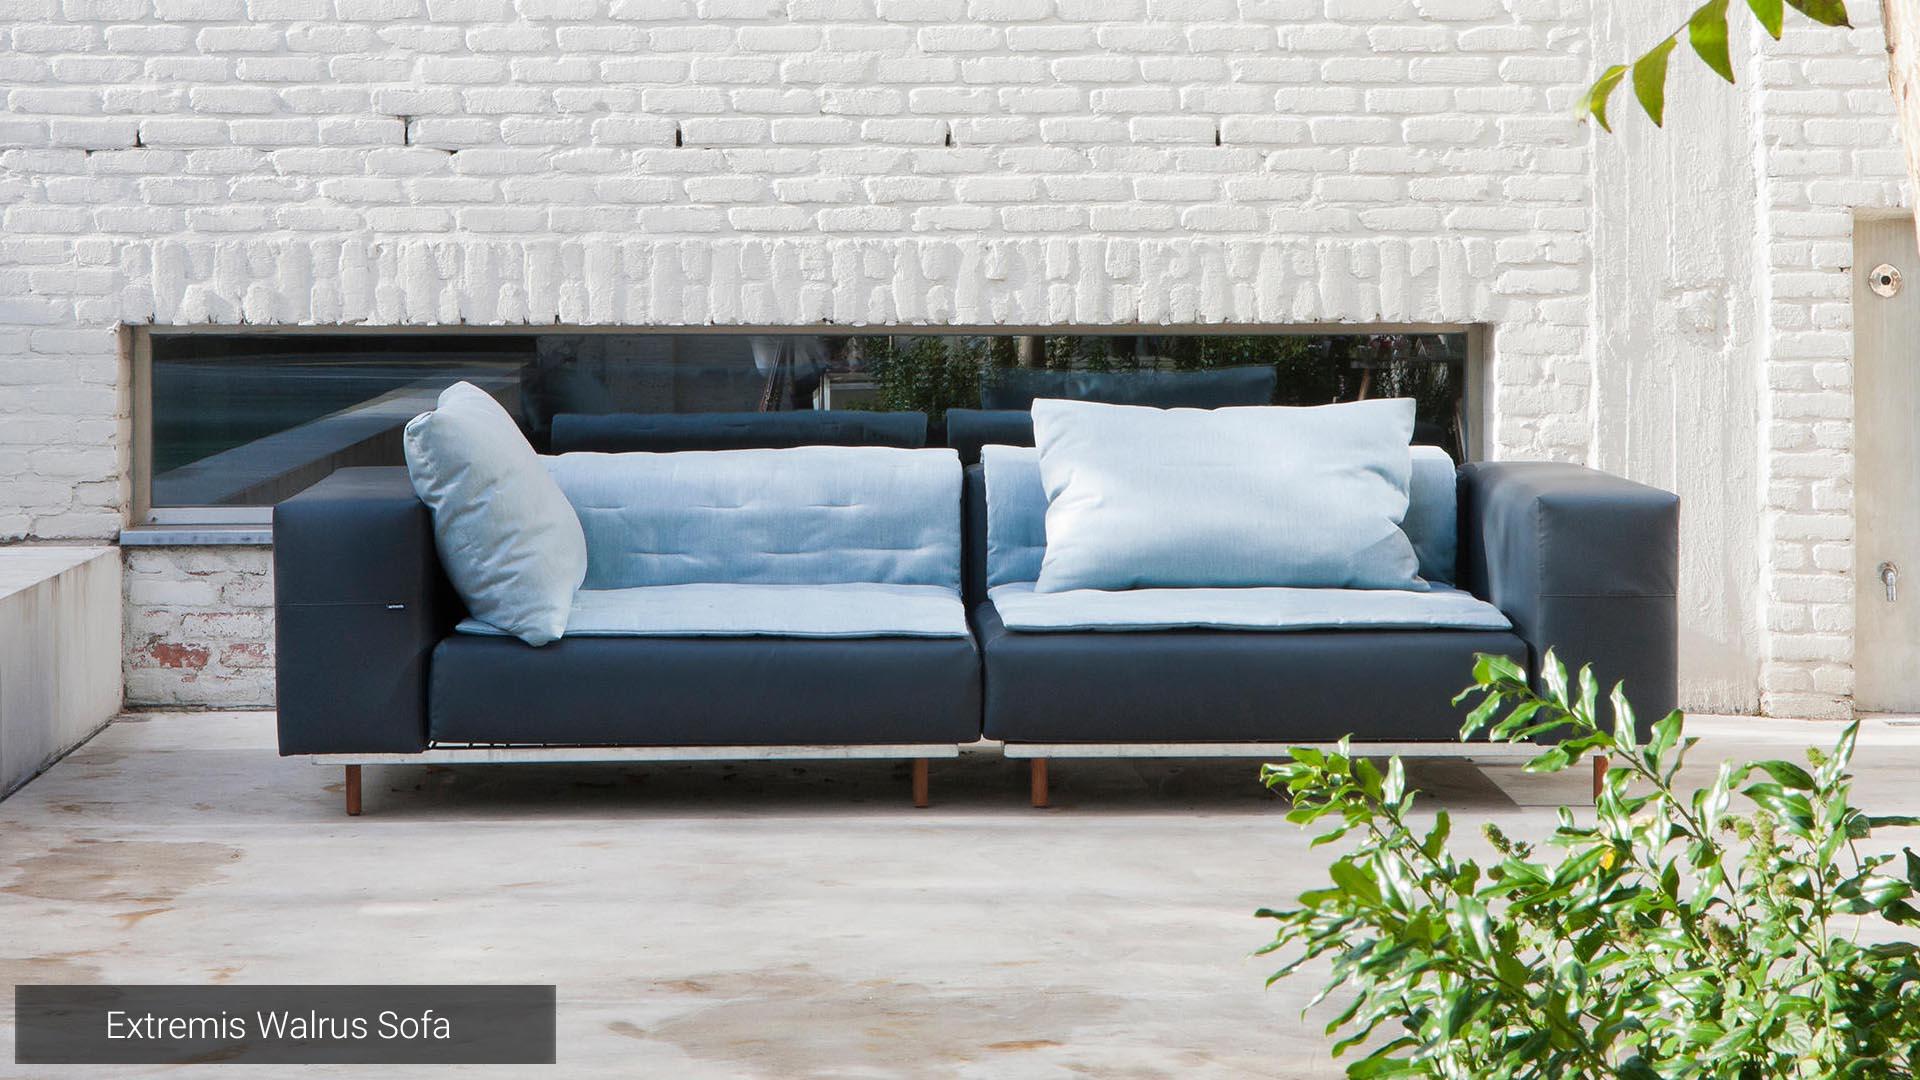 Extremis Walrus Sofa